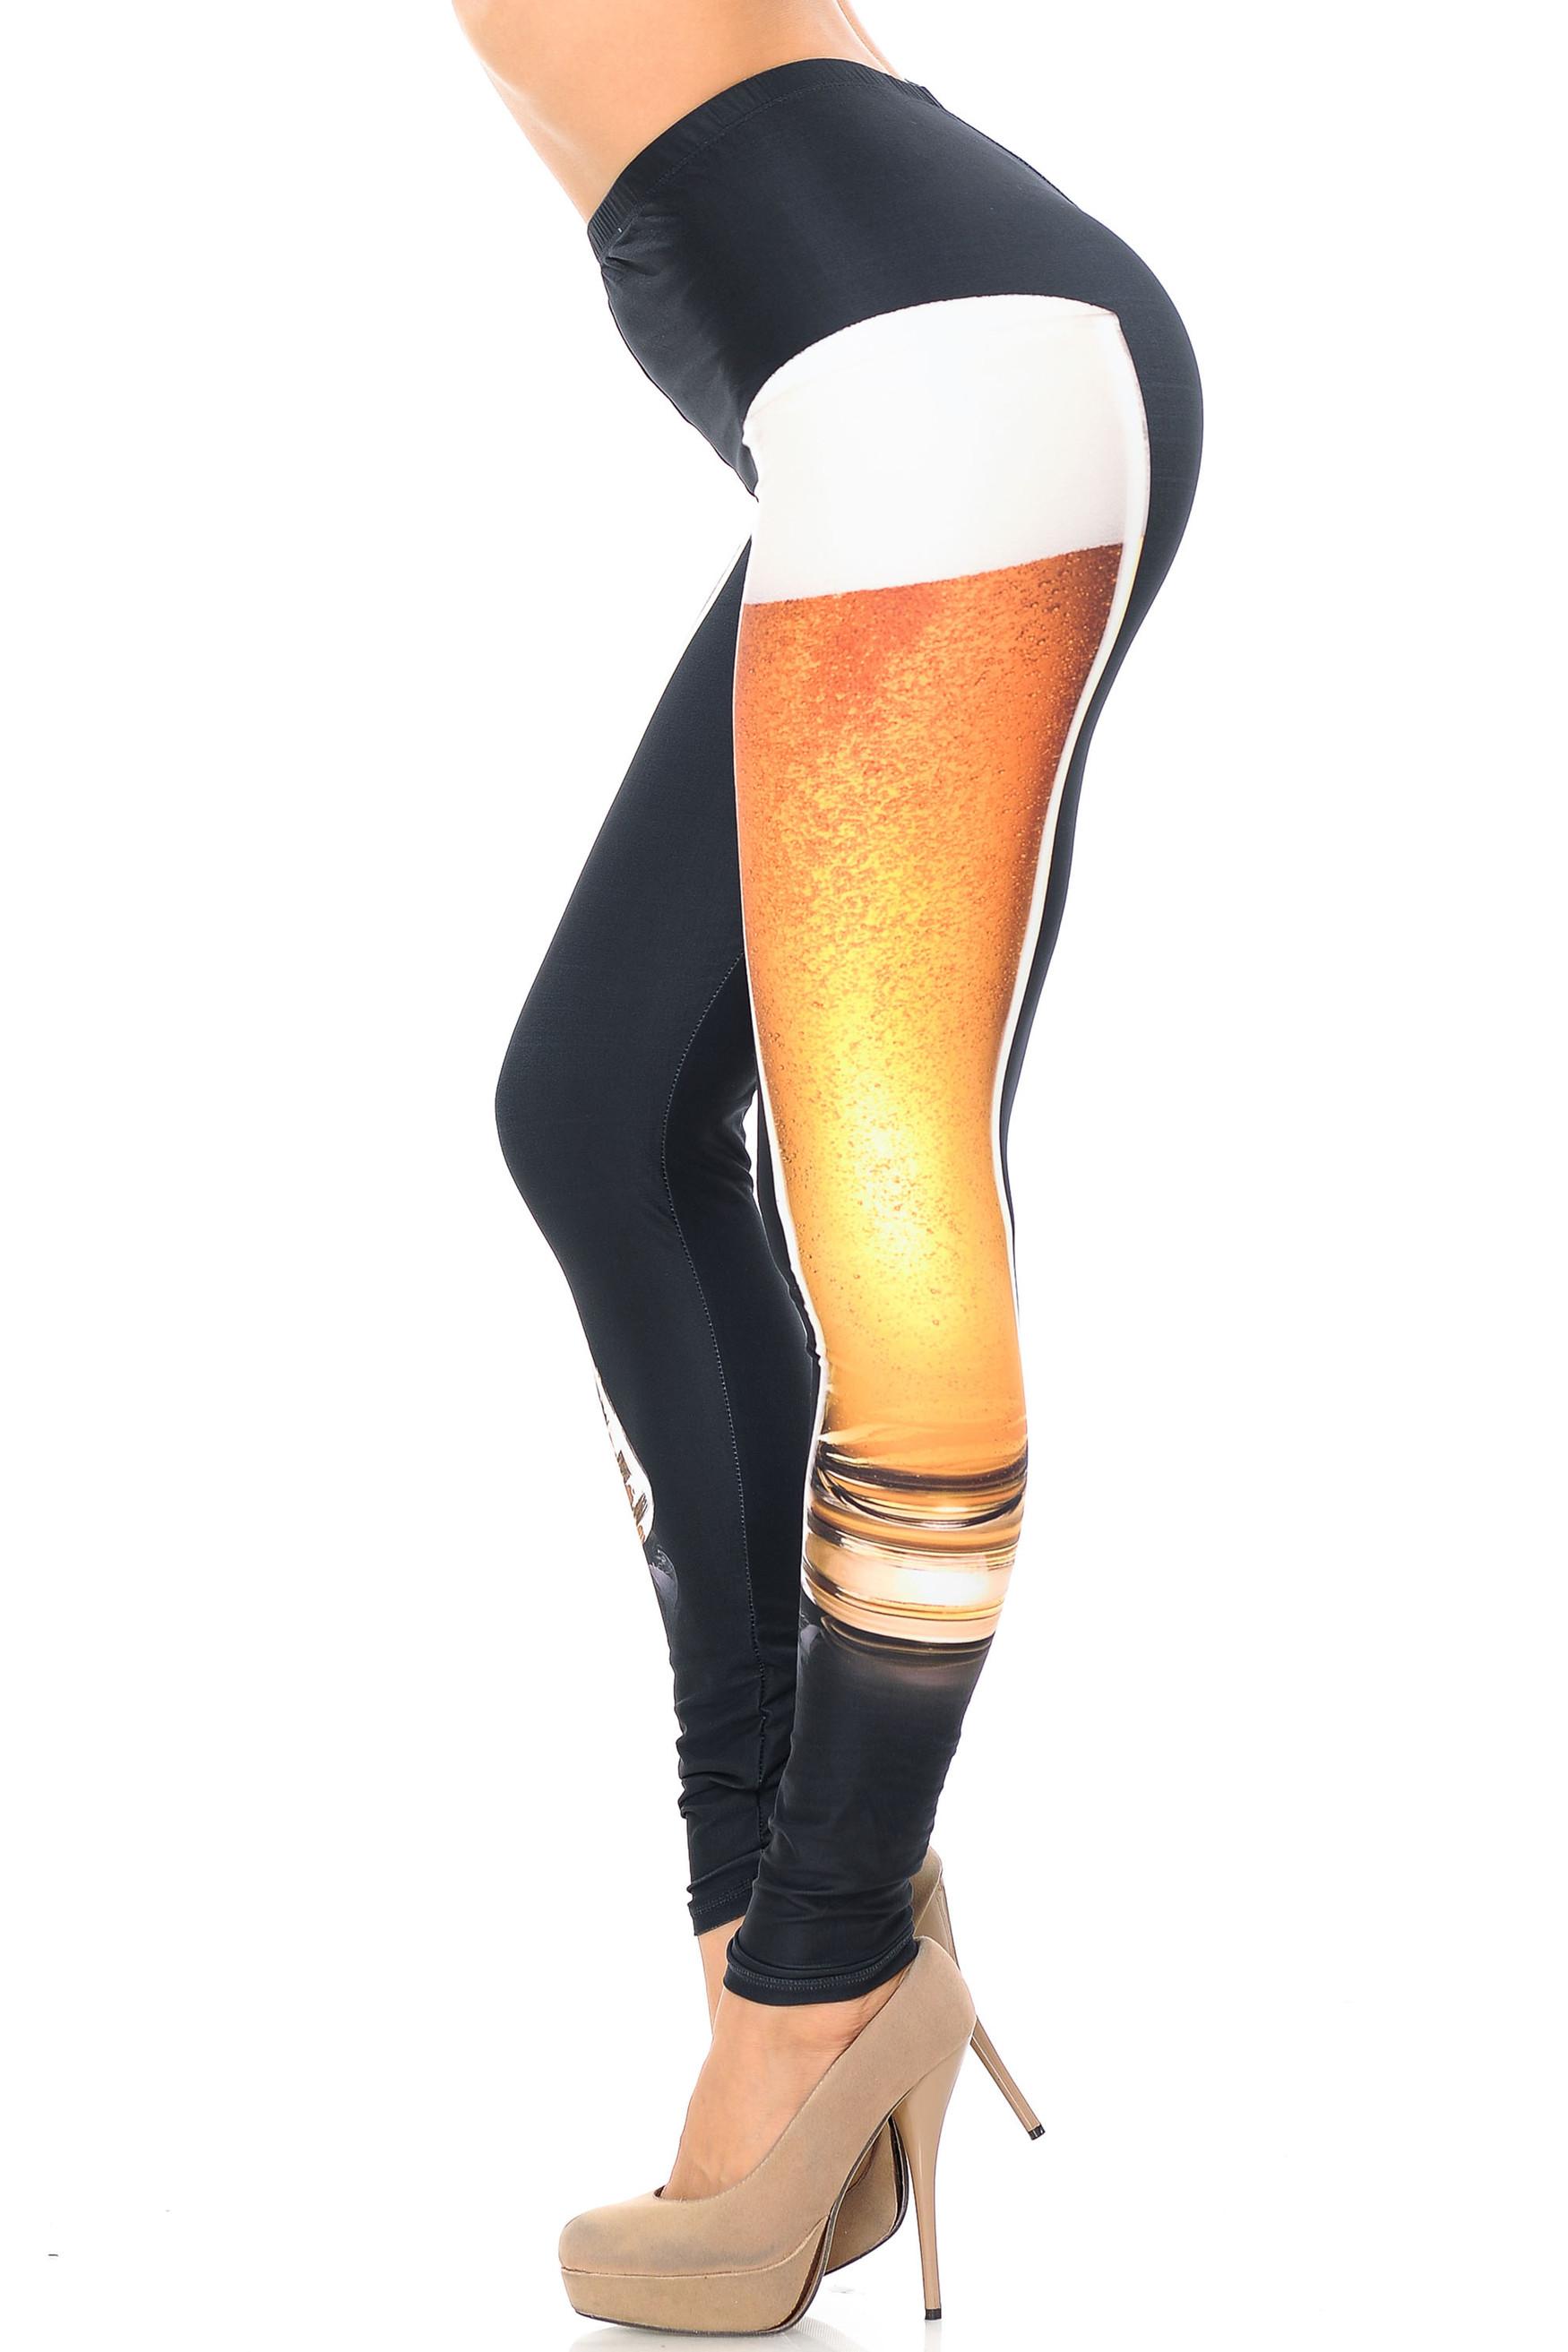 Creamy Soft Draft Beer Plus Size Leggings - USA Fashion™